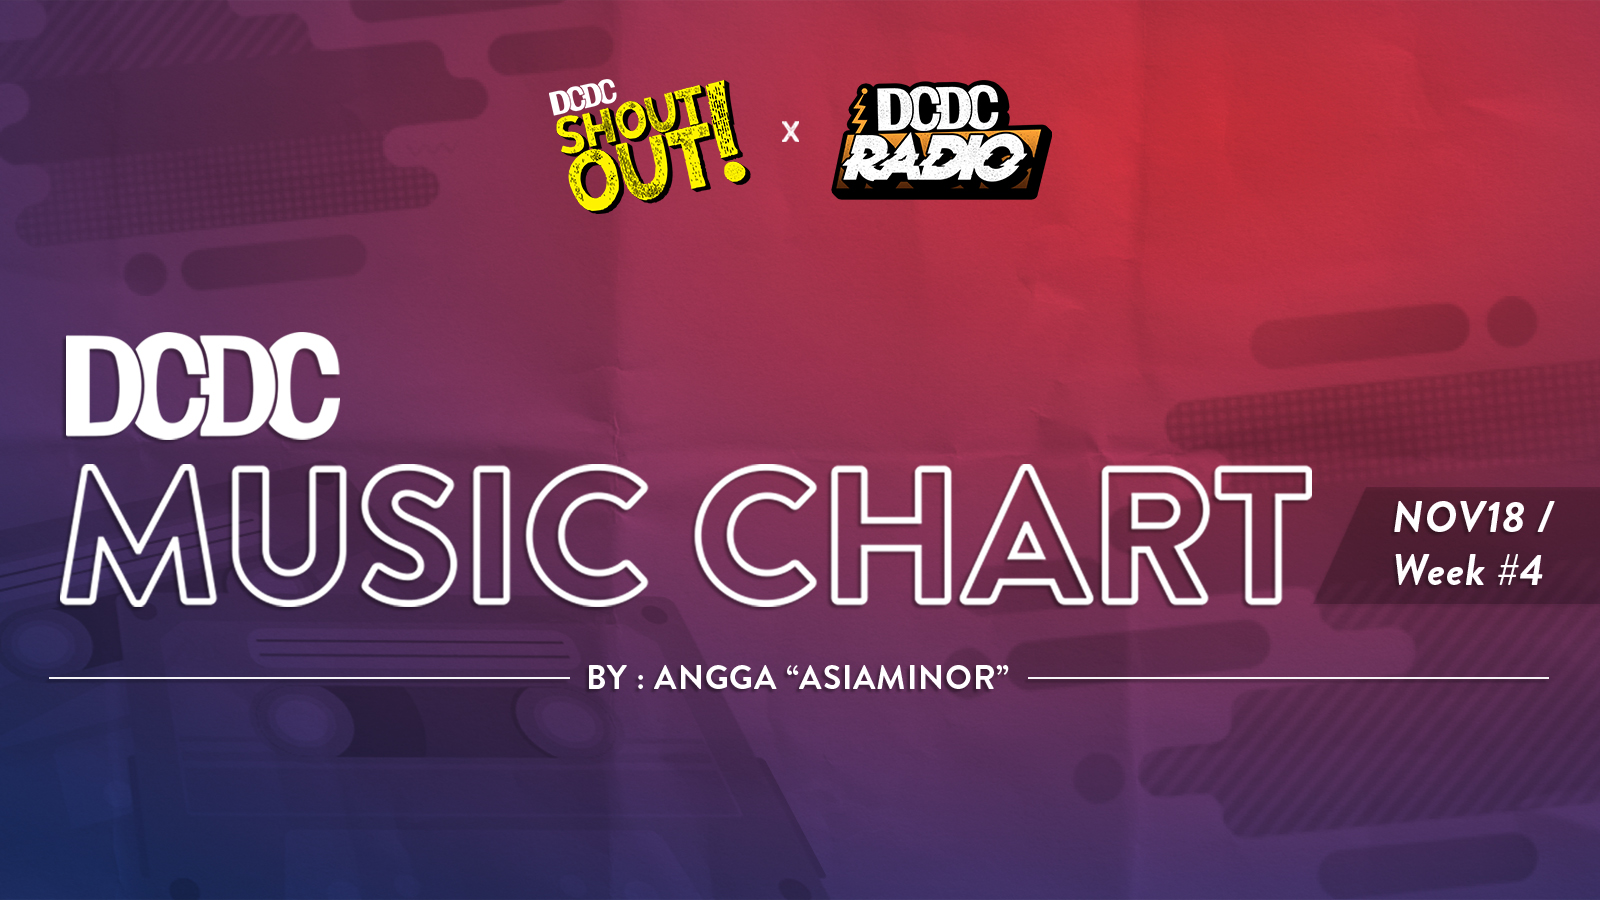 DCDC Music Chart - #4th Week of November 2018